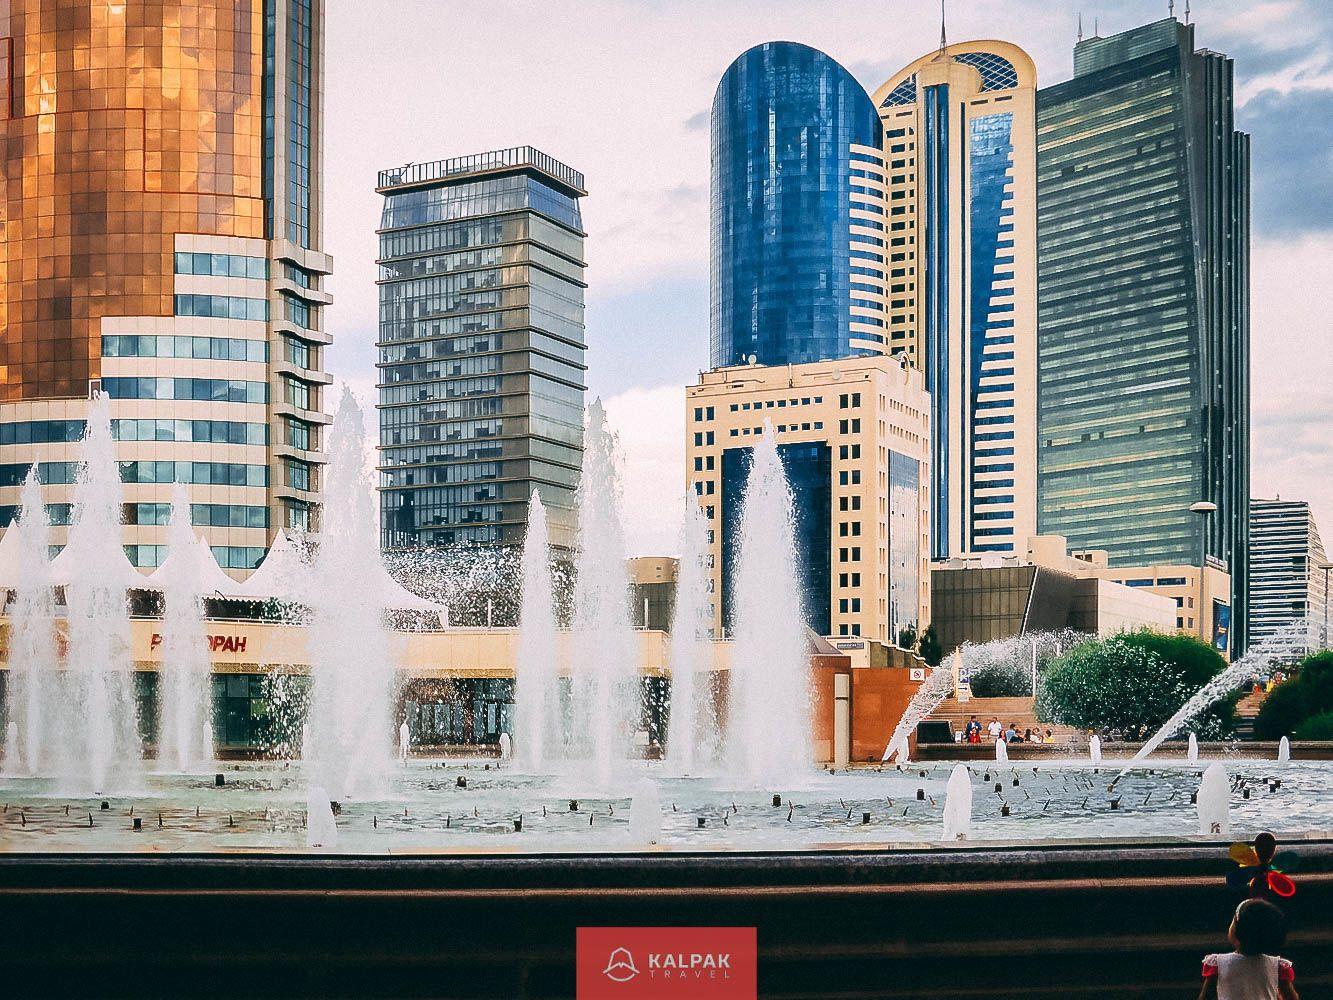 Central Asia, Kazakhstan, Astana